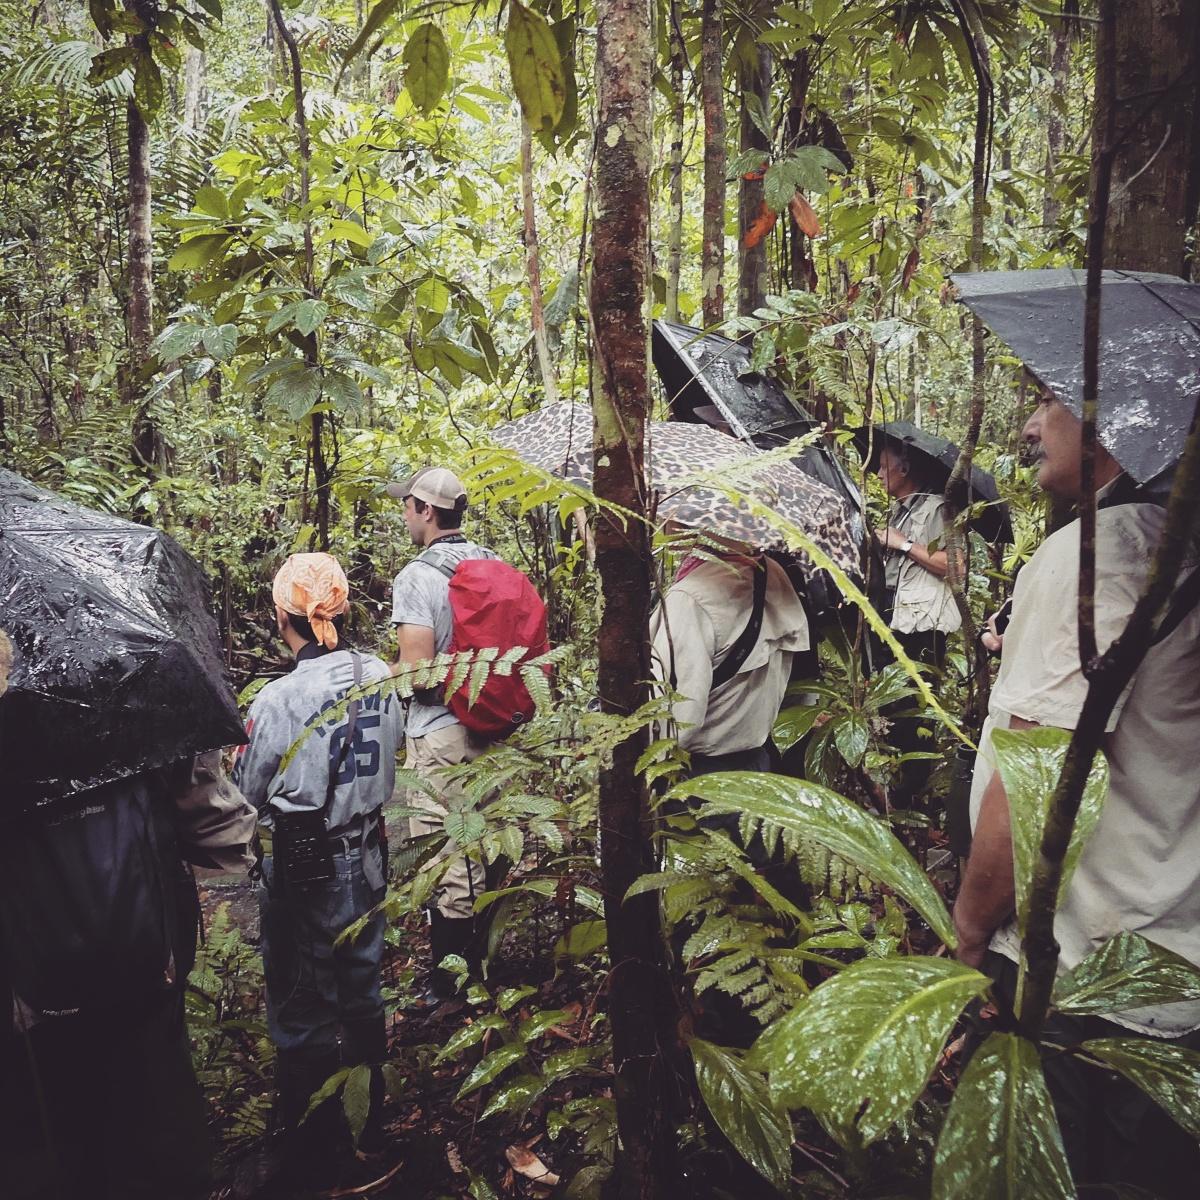 Birding under umbrellas in the forest at Shiripuno Lodge, Ecuador. Noah Strycker